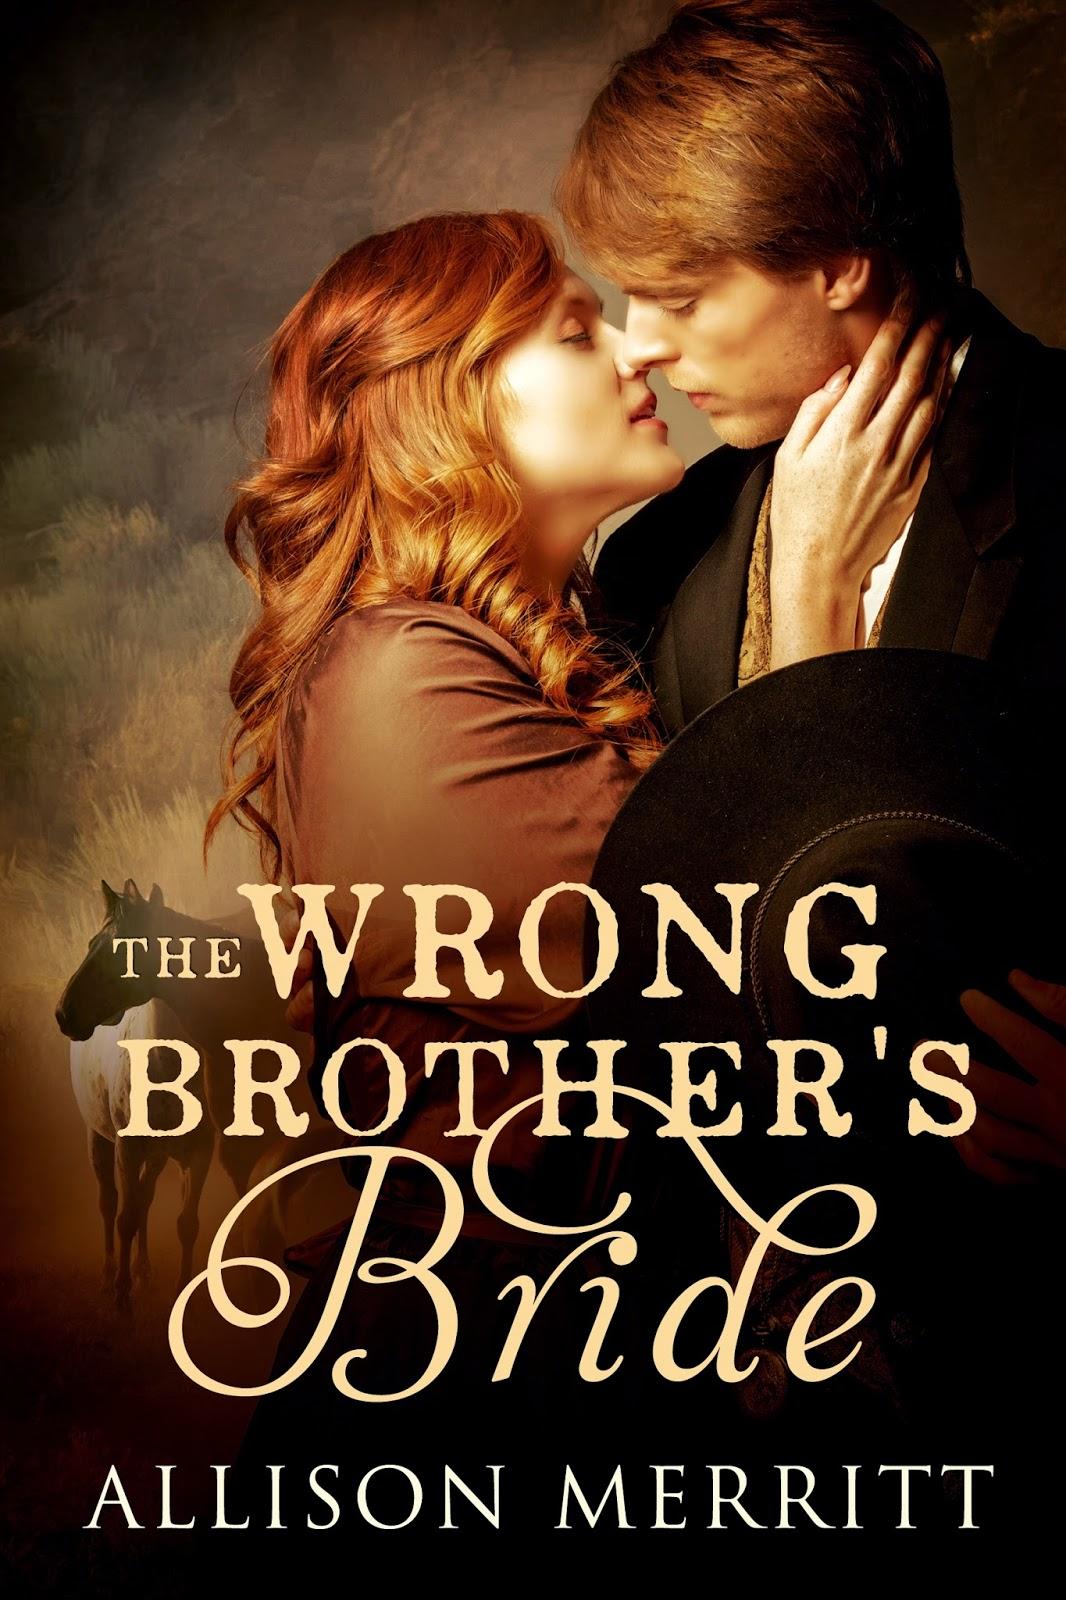 Interview with historical romance author Allison Merritt